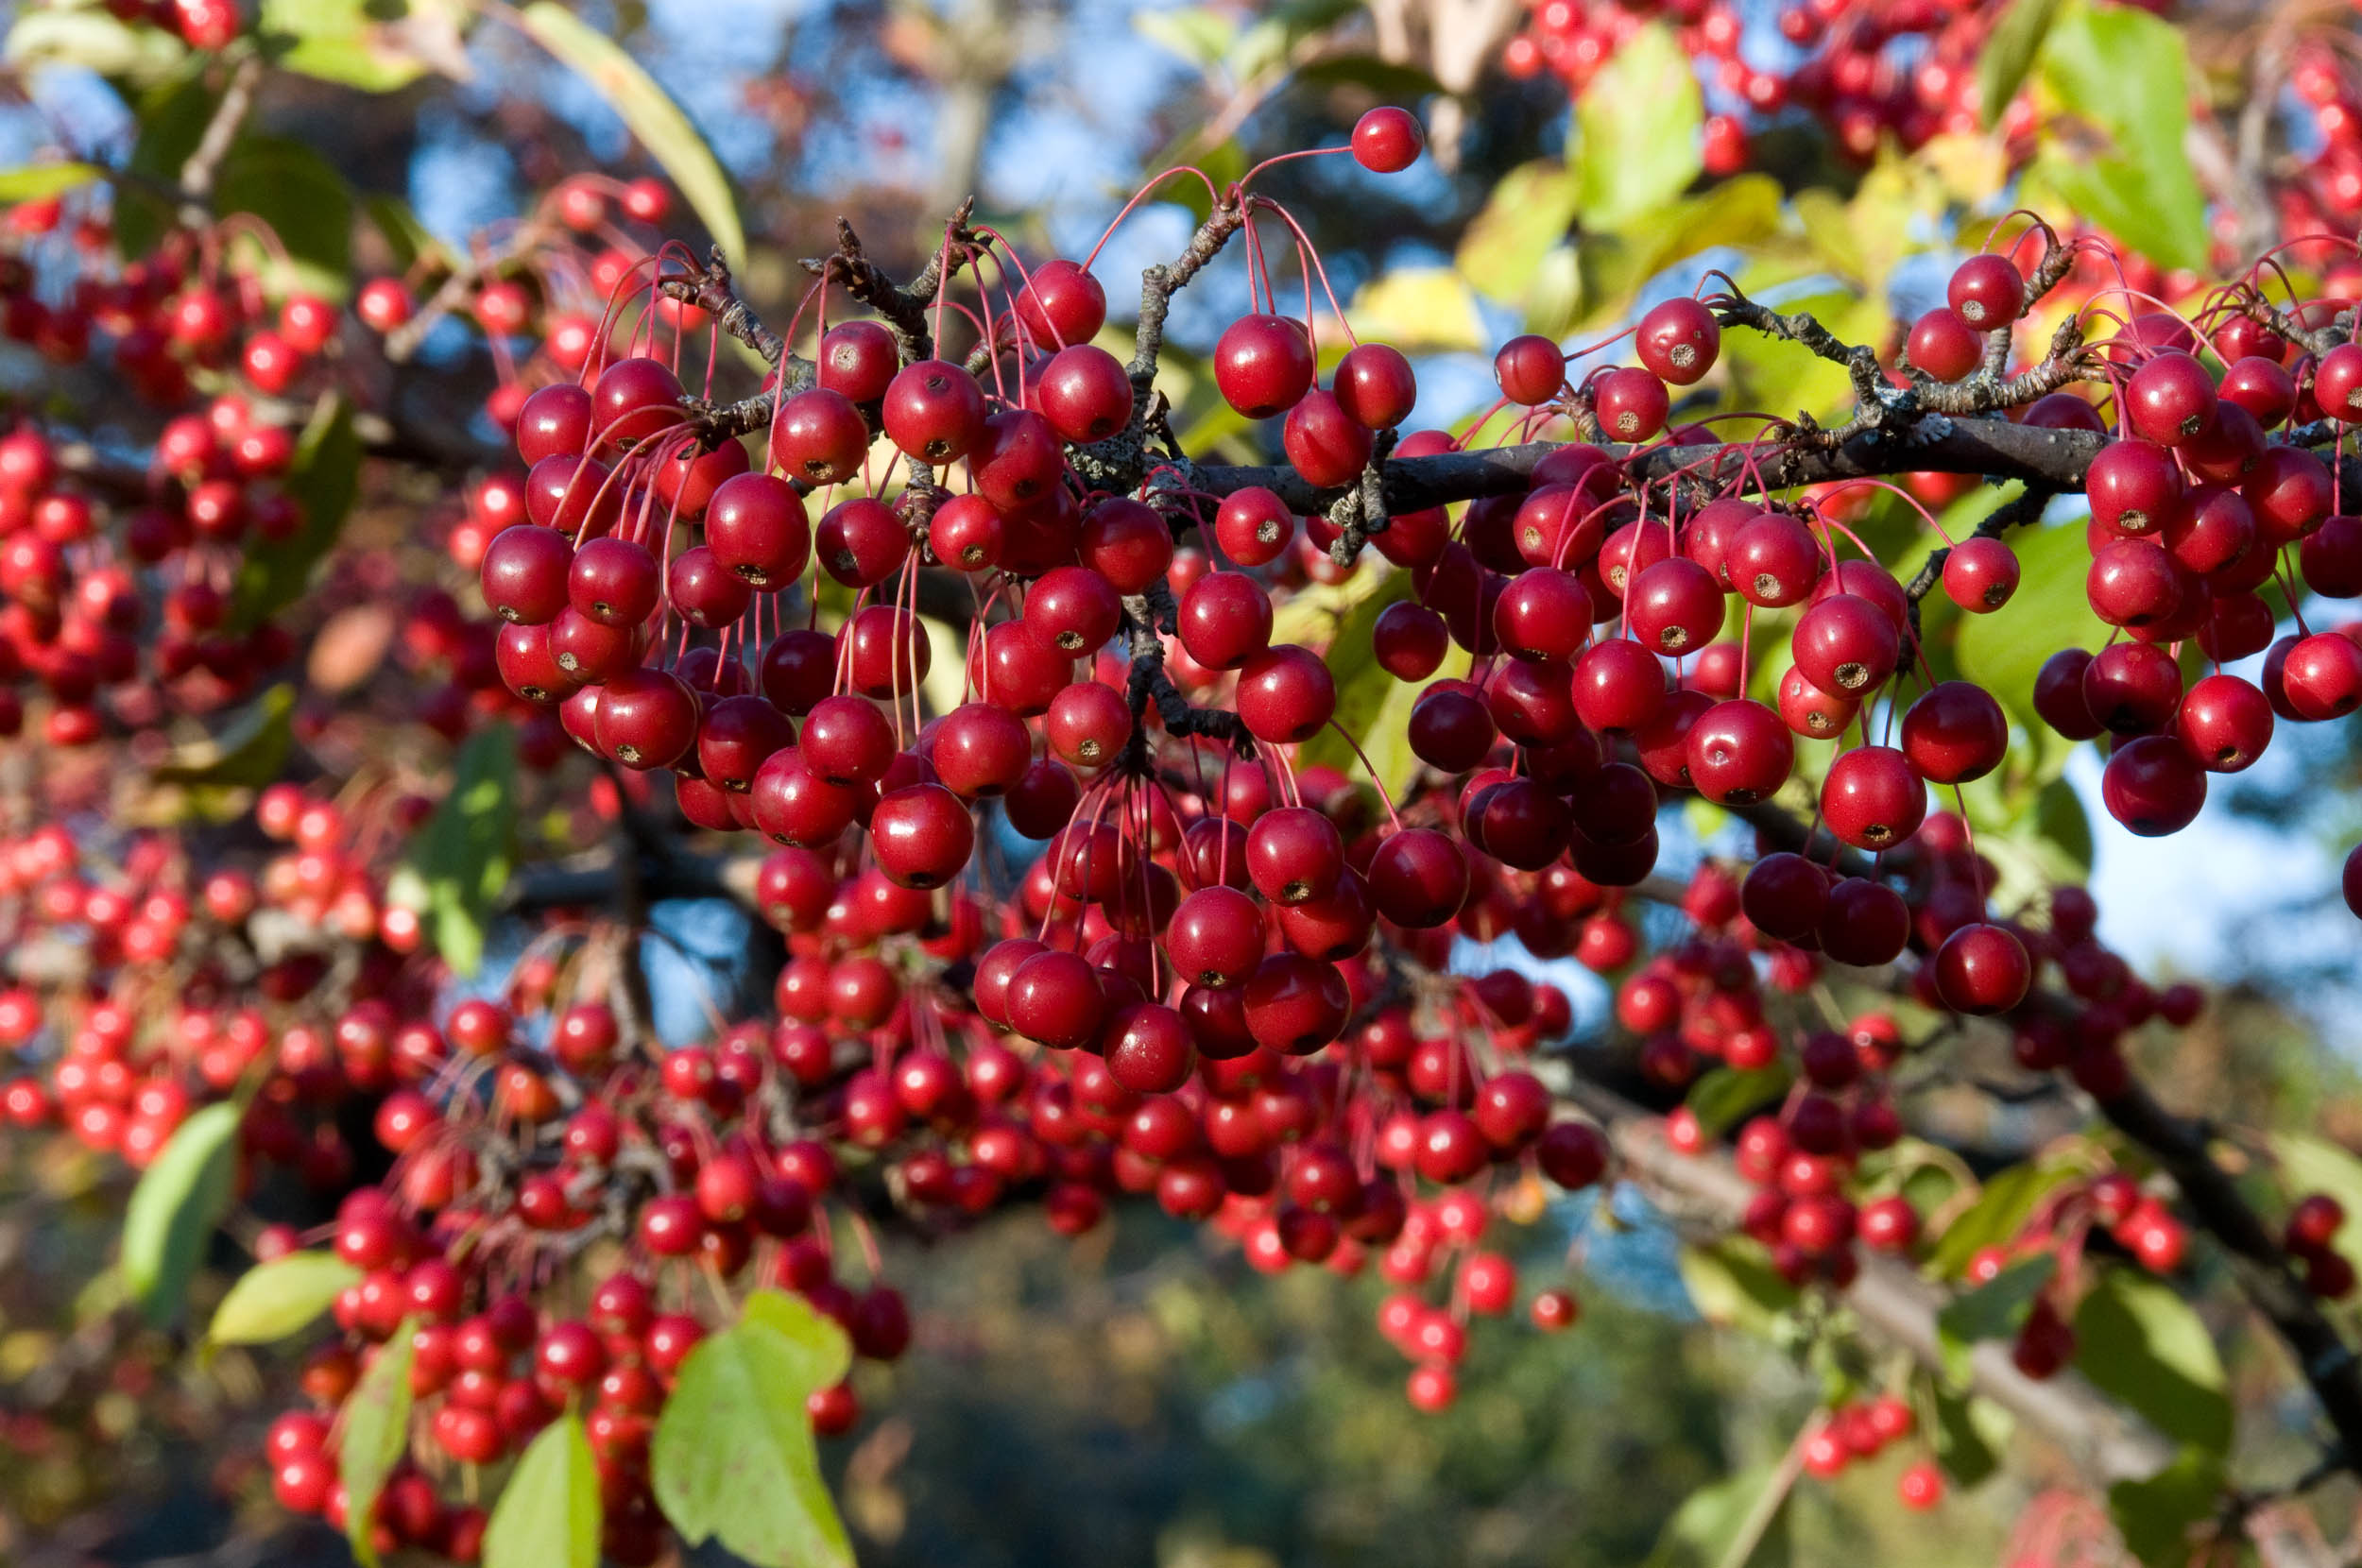 Un fruct mai puţin cunoscut ar putea trata cancerul pancretic